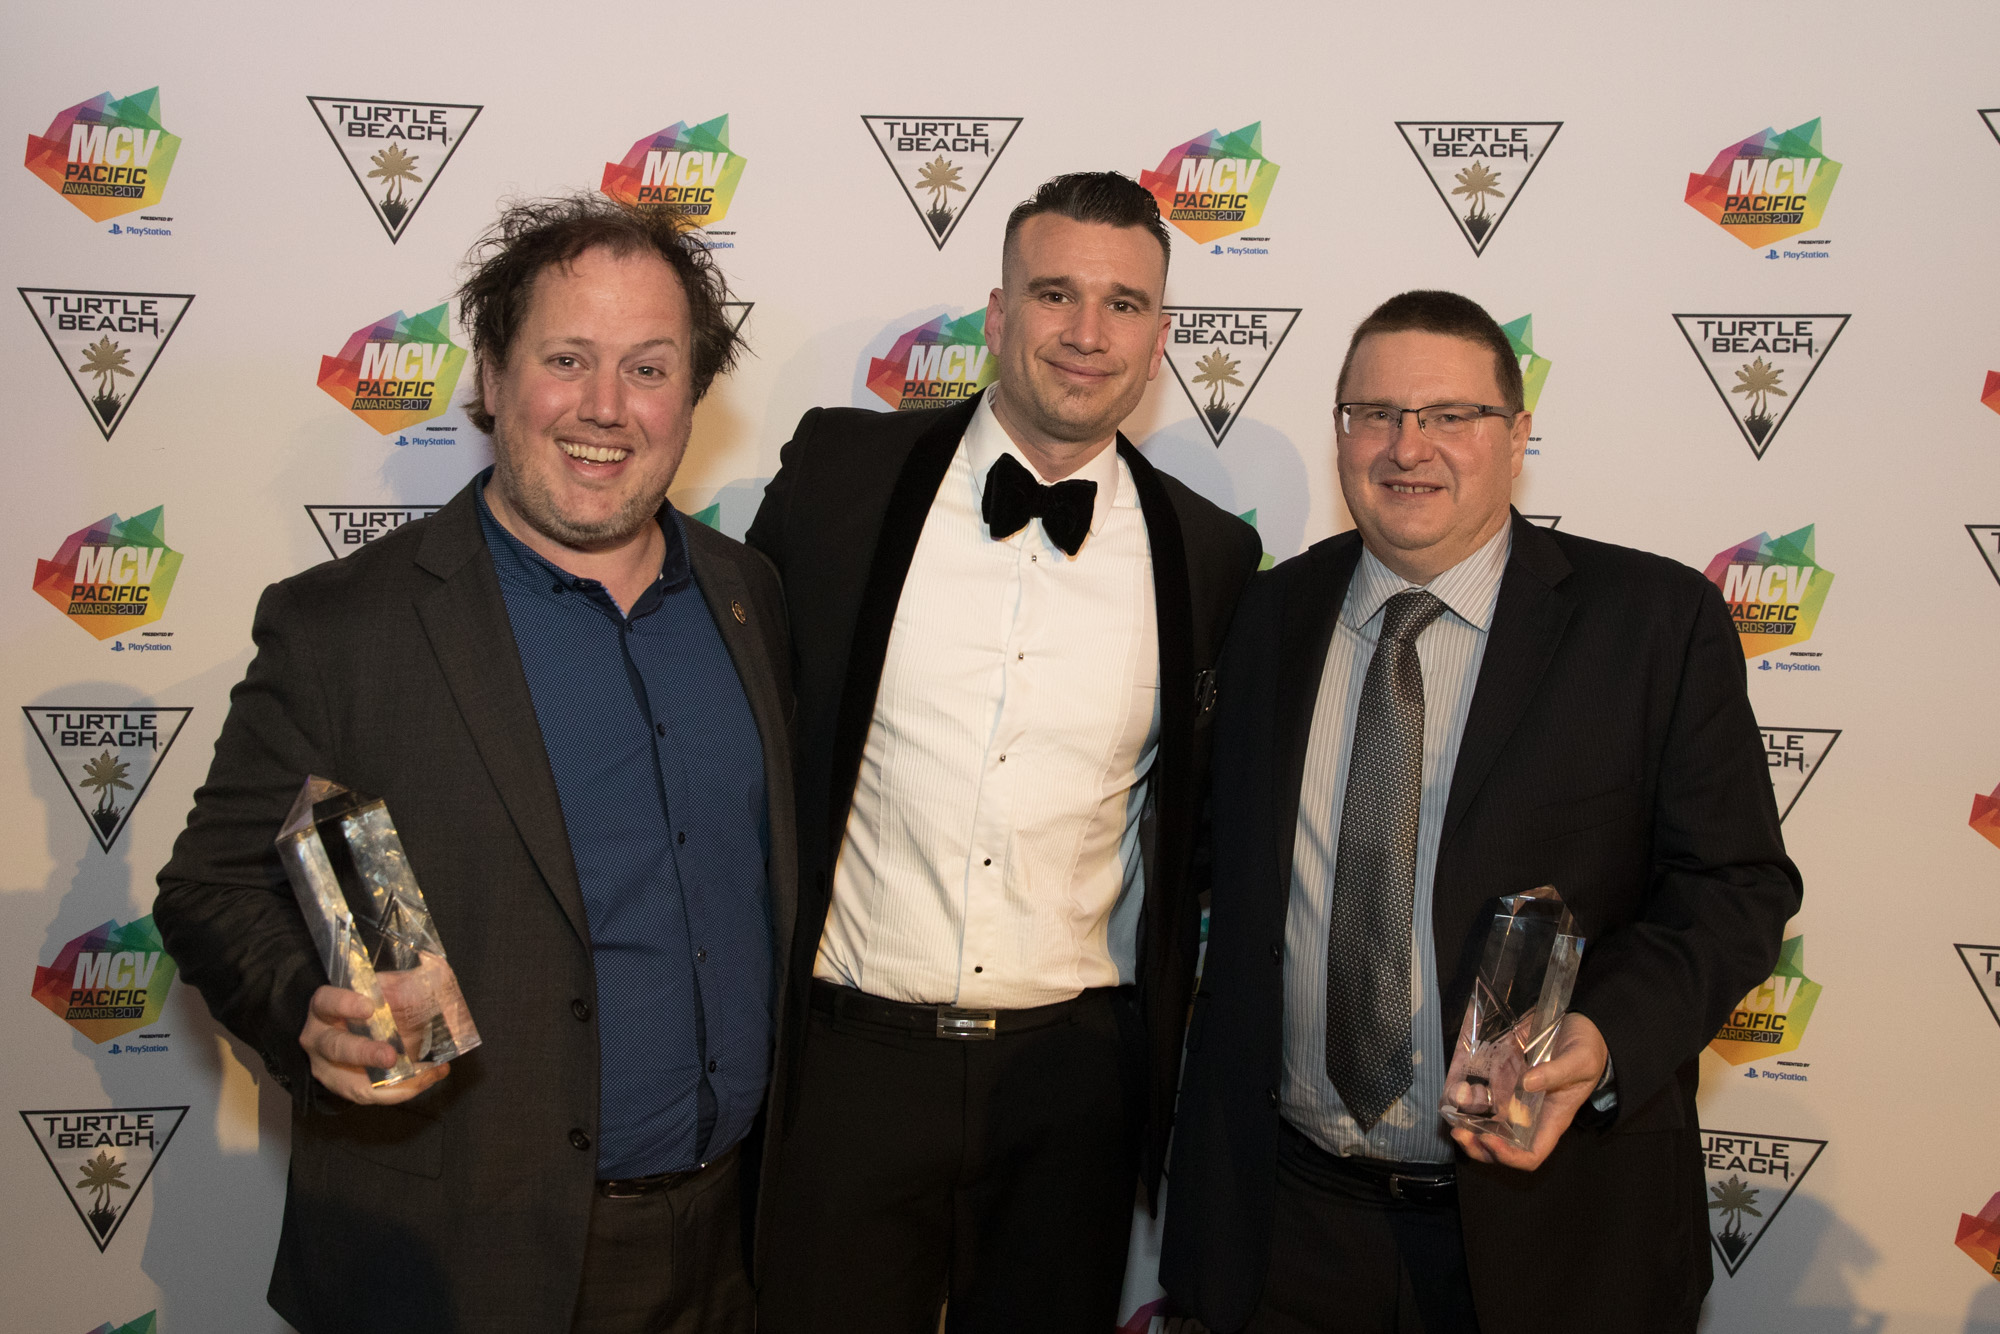 MCV_Pacific_Awards_1_June_17_PS_215.jpg